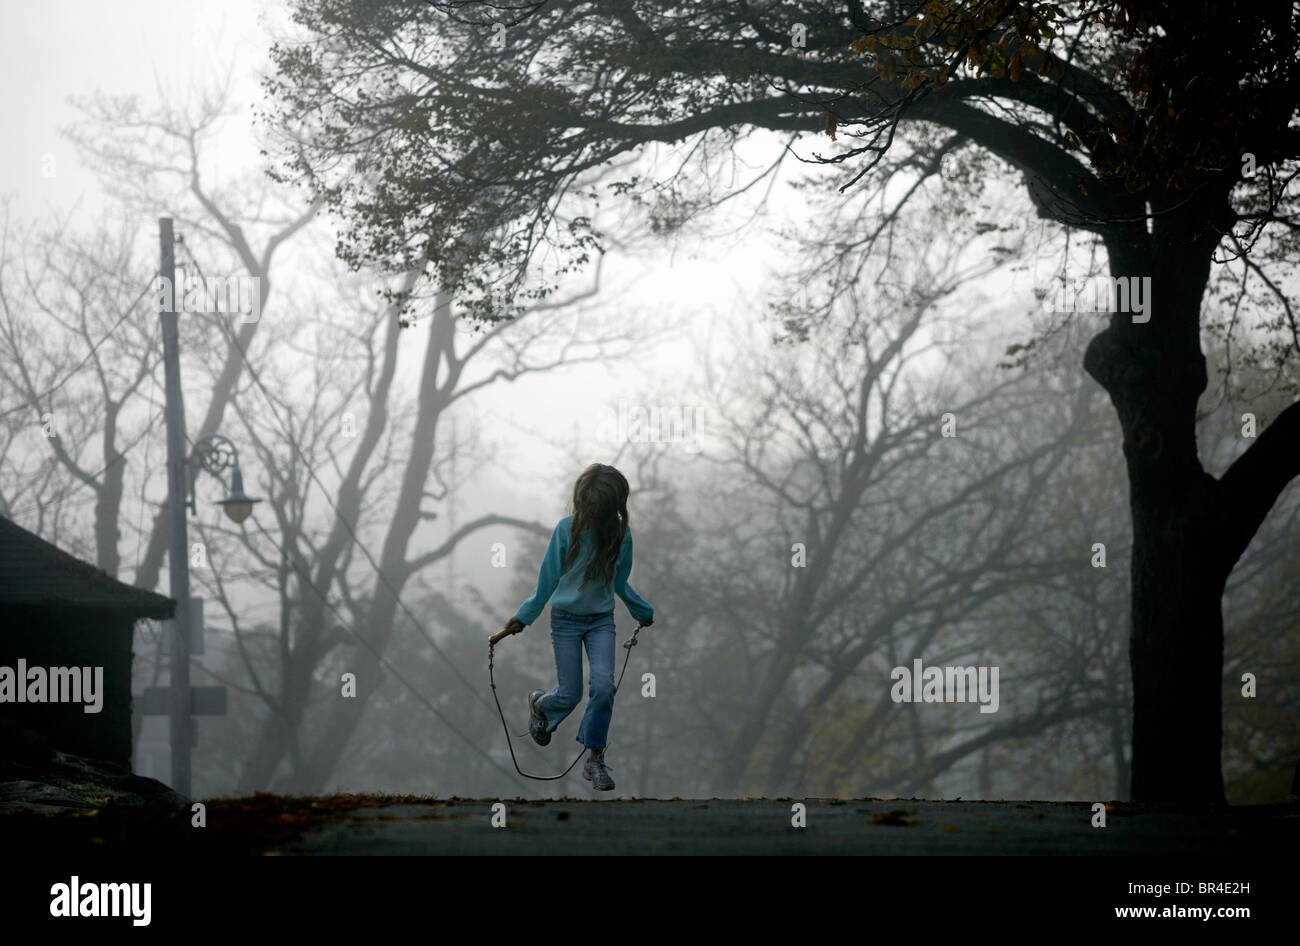 Una ragazzina salta la corda. Immagini Stock